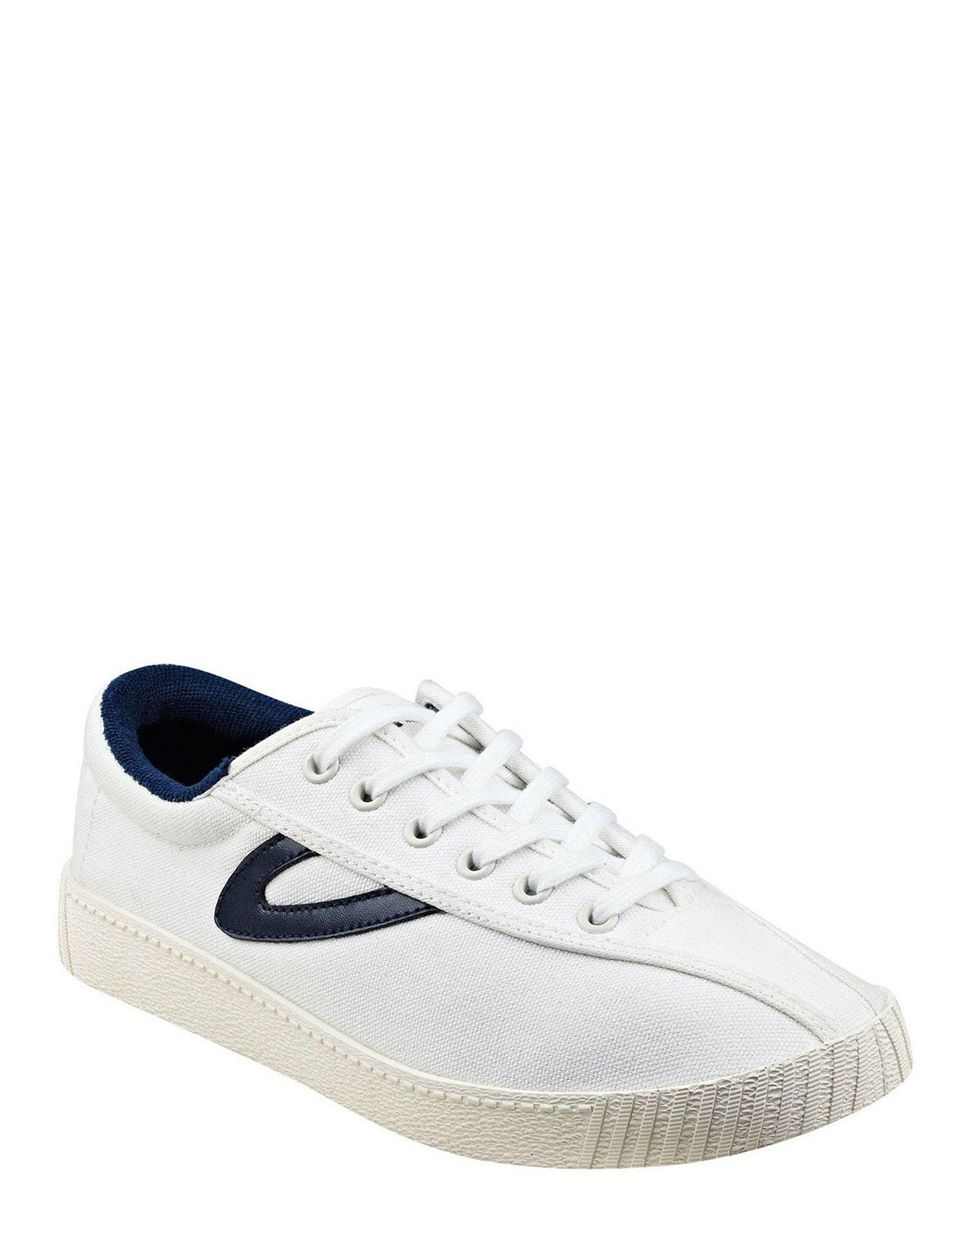 Tretorn Nylite Sneaker